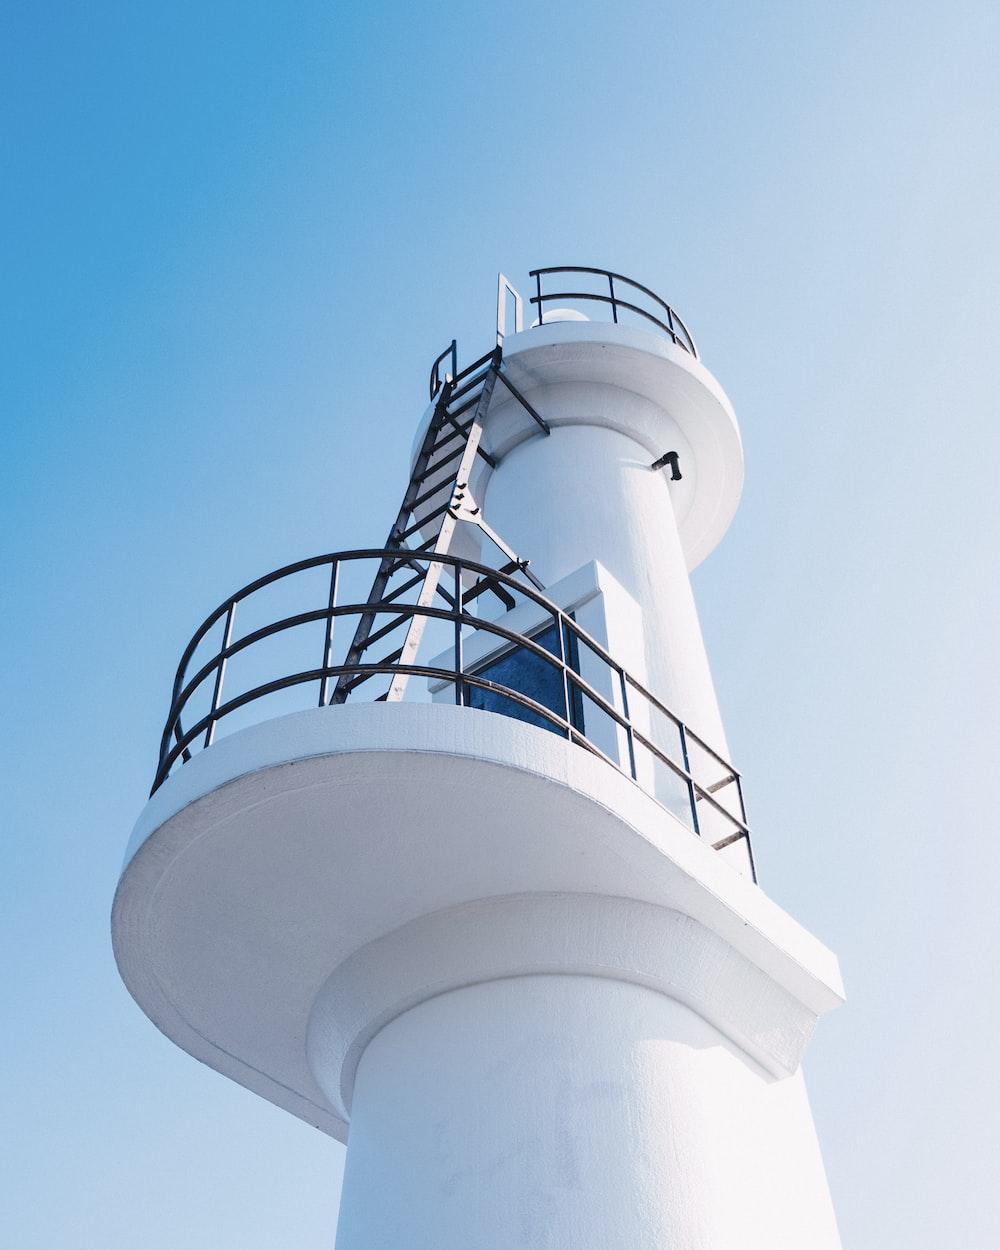 white tower under blue sky during daytime